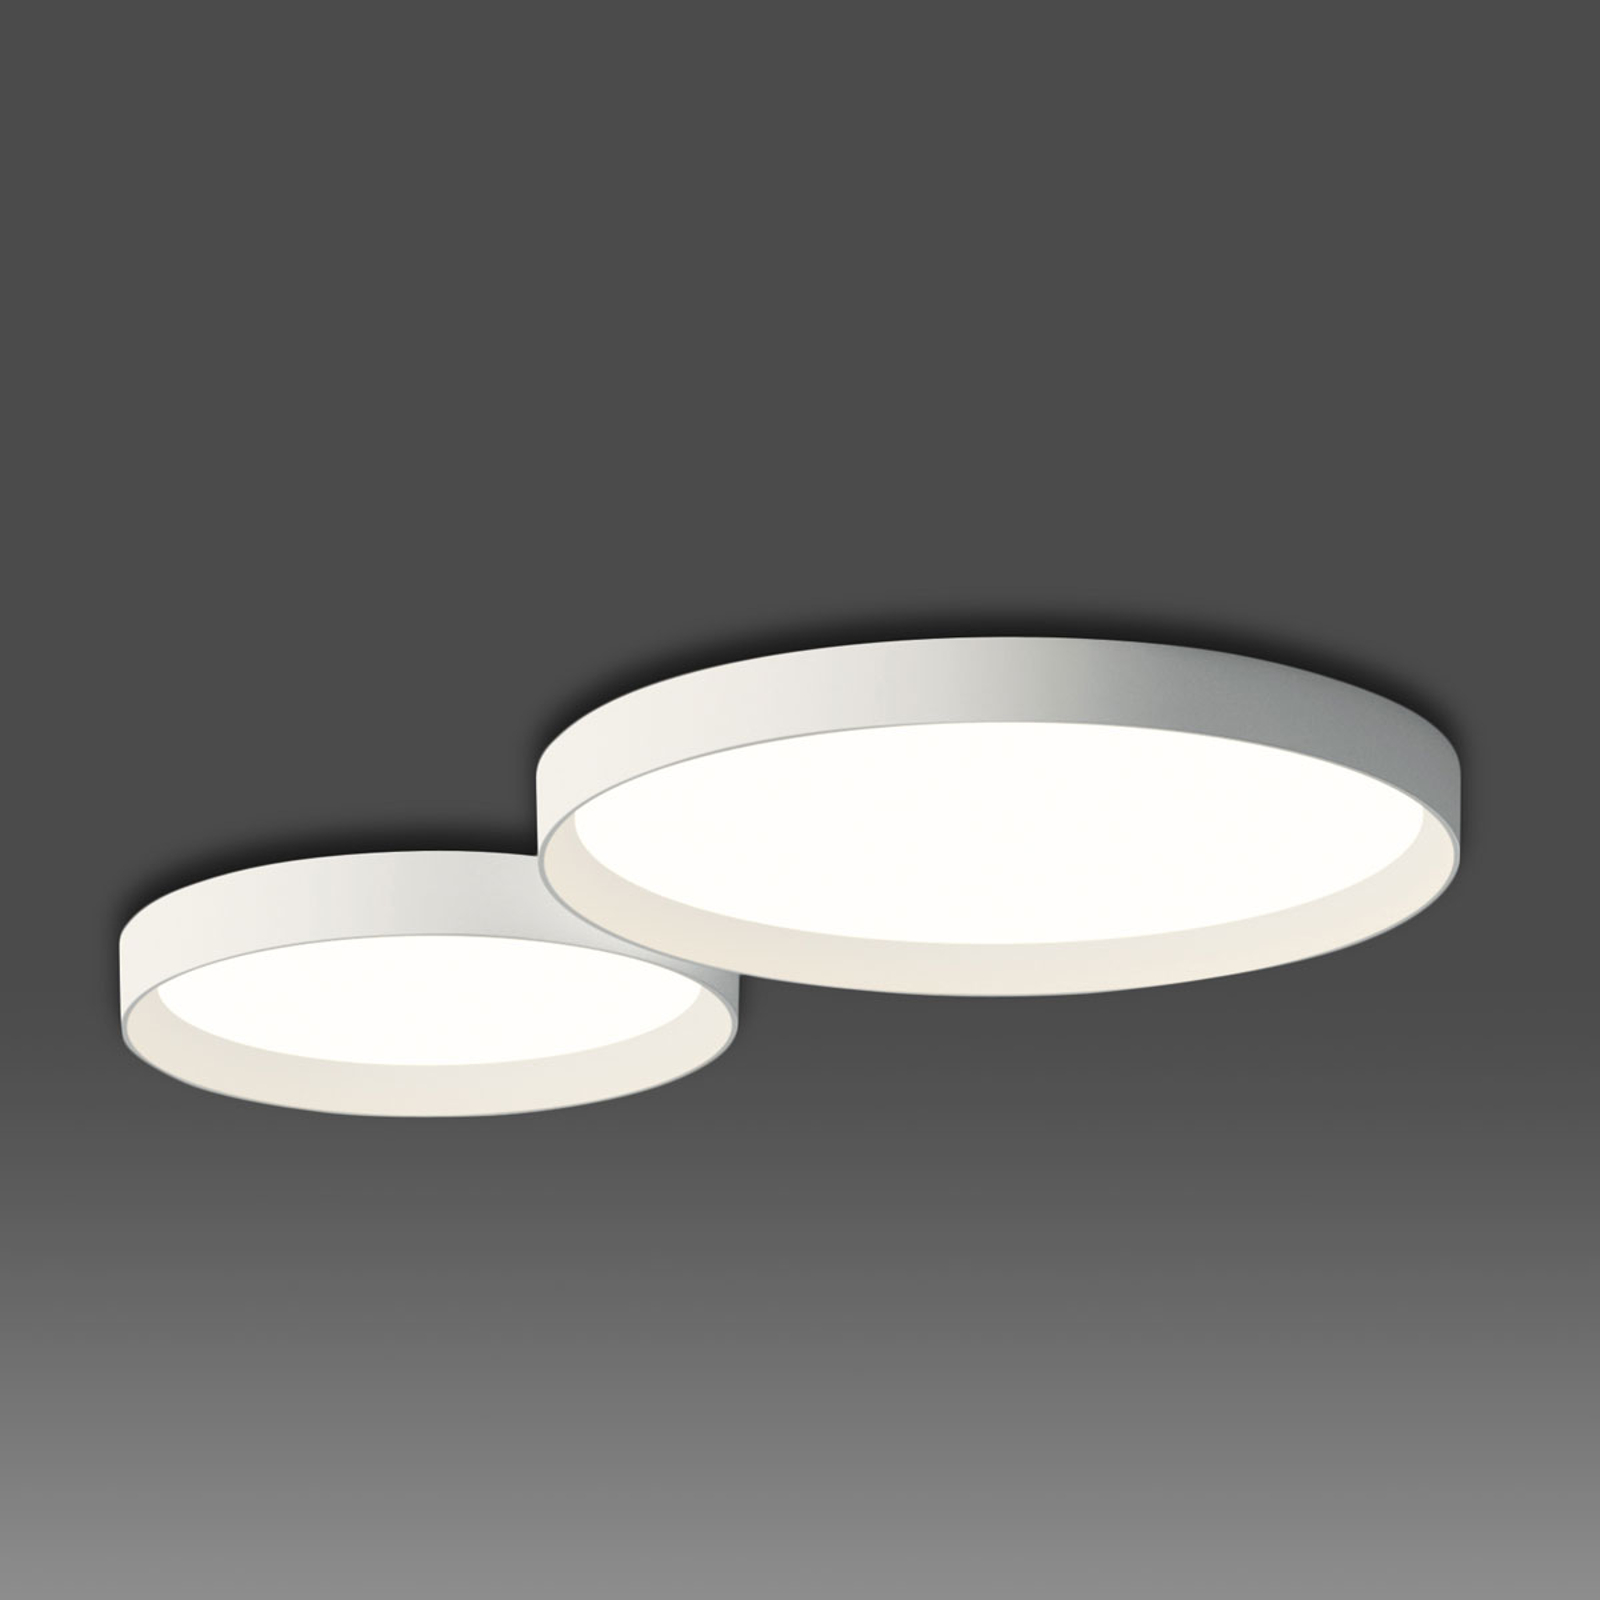 Prosta lampa sufitowa LED UP, biała